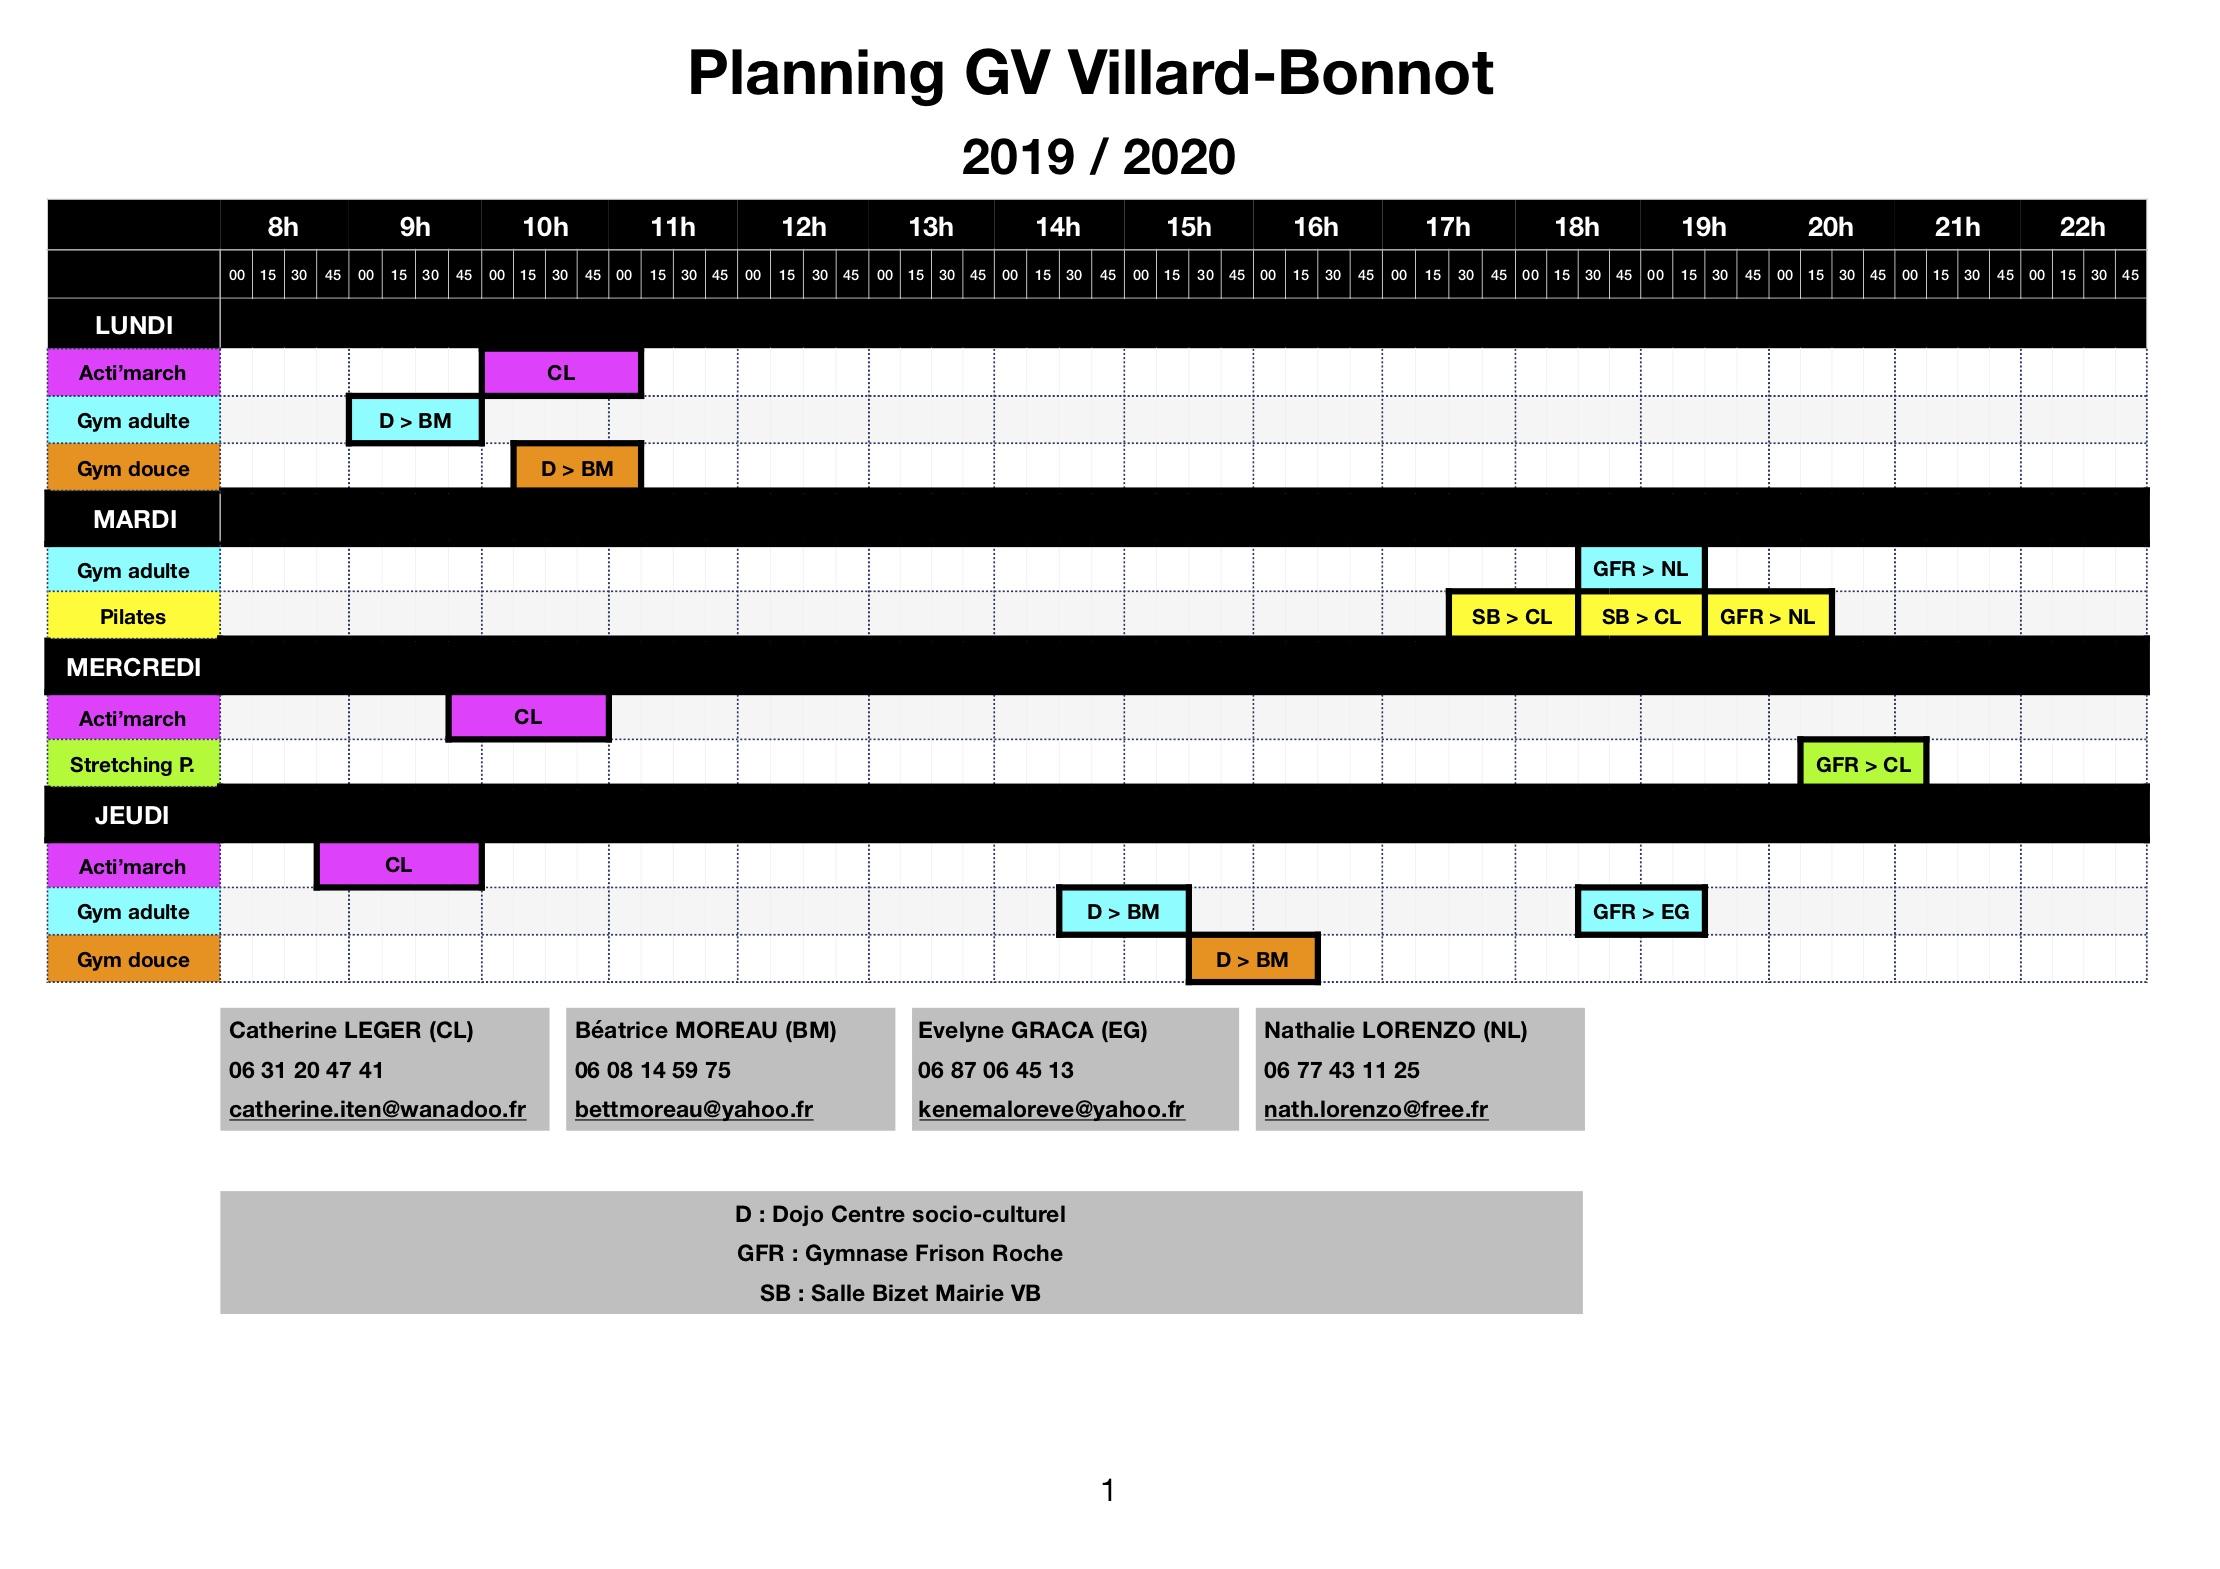 GV VB _ 2019-2020 _ PLANNING GÉNÉRAL DES COURS.jpg